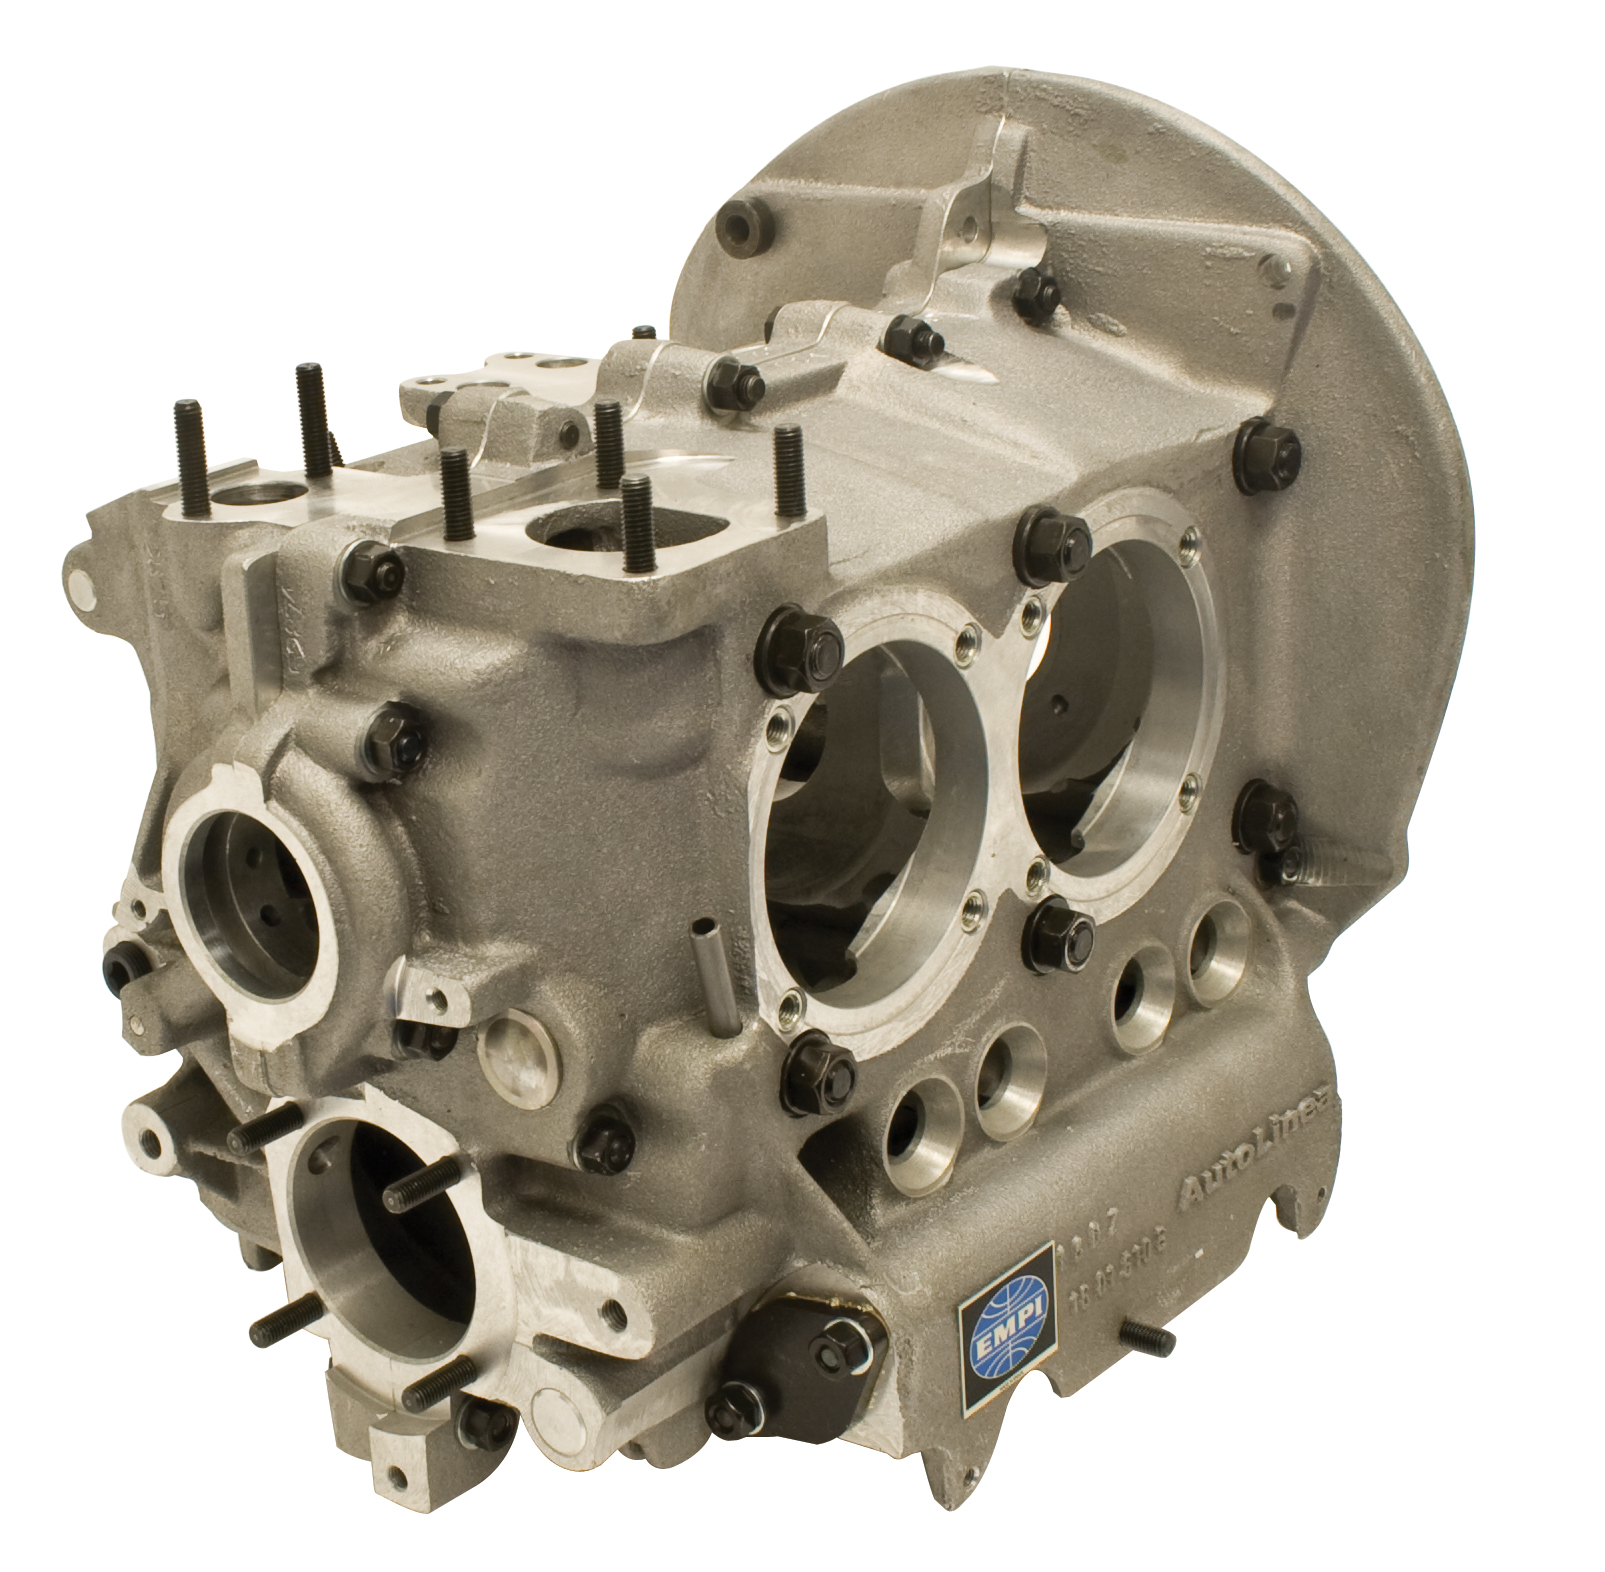 Vw Bug Engine Case For Sale: EMPI H.D. Bubble Top Engine Cases